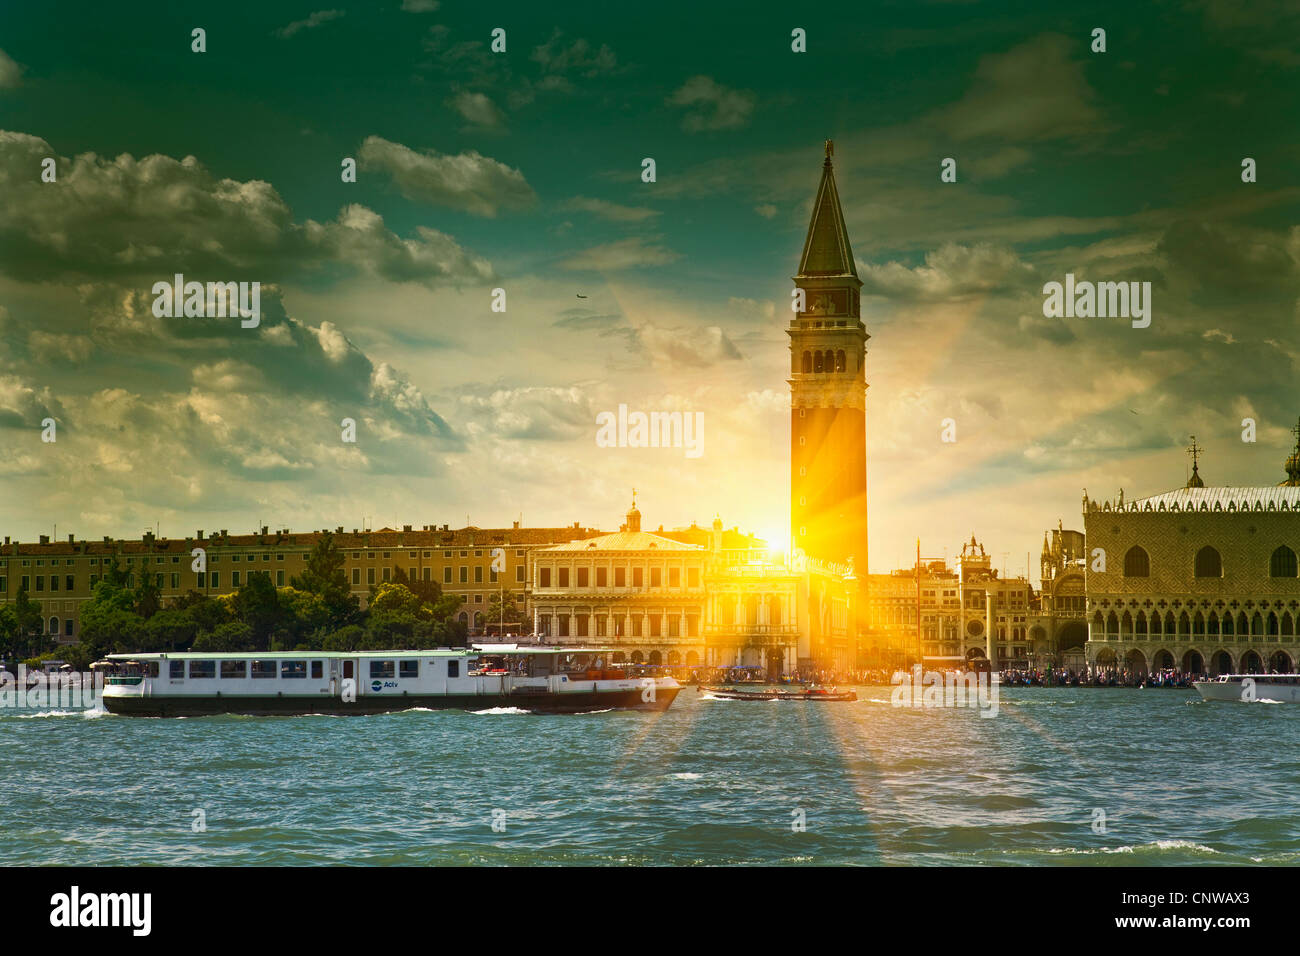 Sun shining through urban buildings - Stock Image